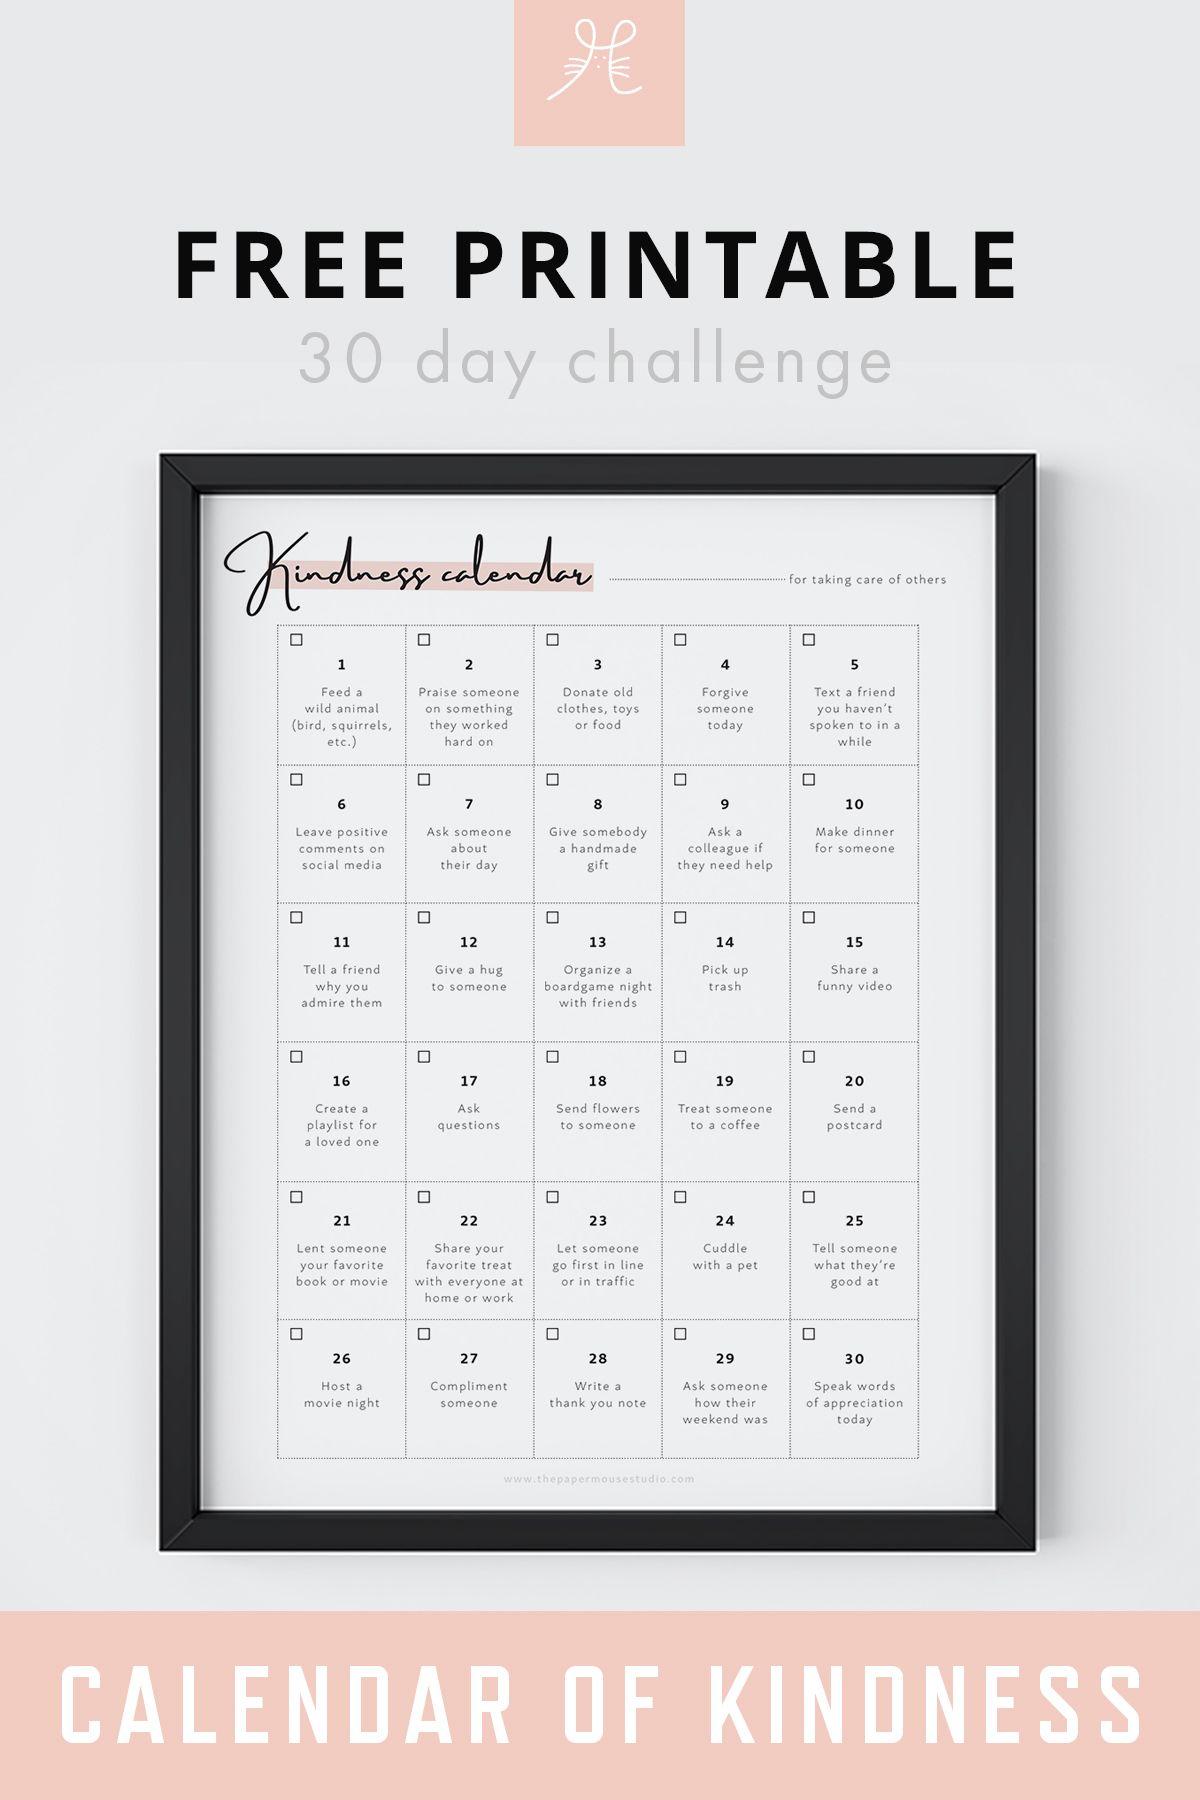 Free Printable 30 Day Challenge Calendar Of Kindness in Blank 30 Day Challenge Calendar